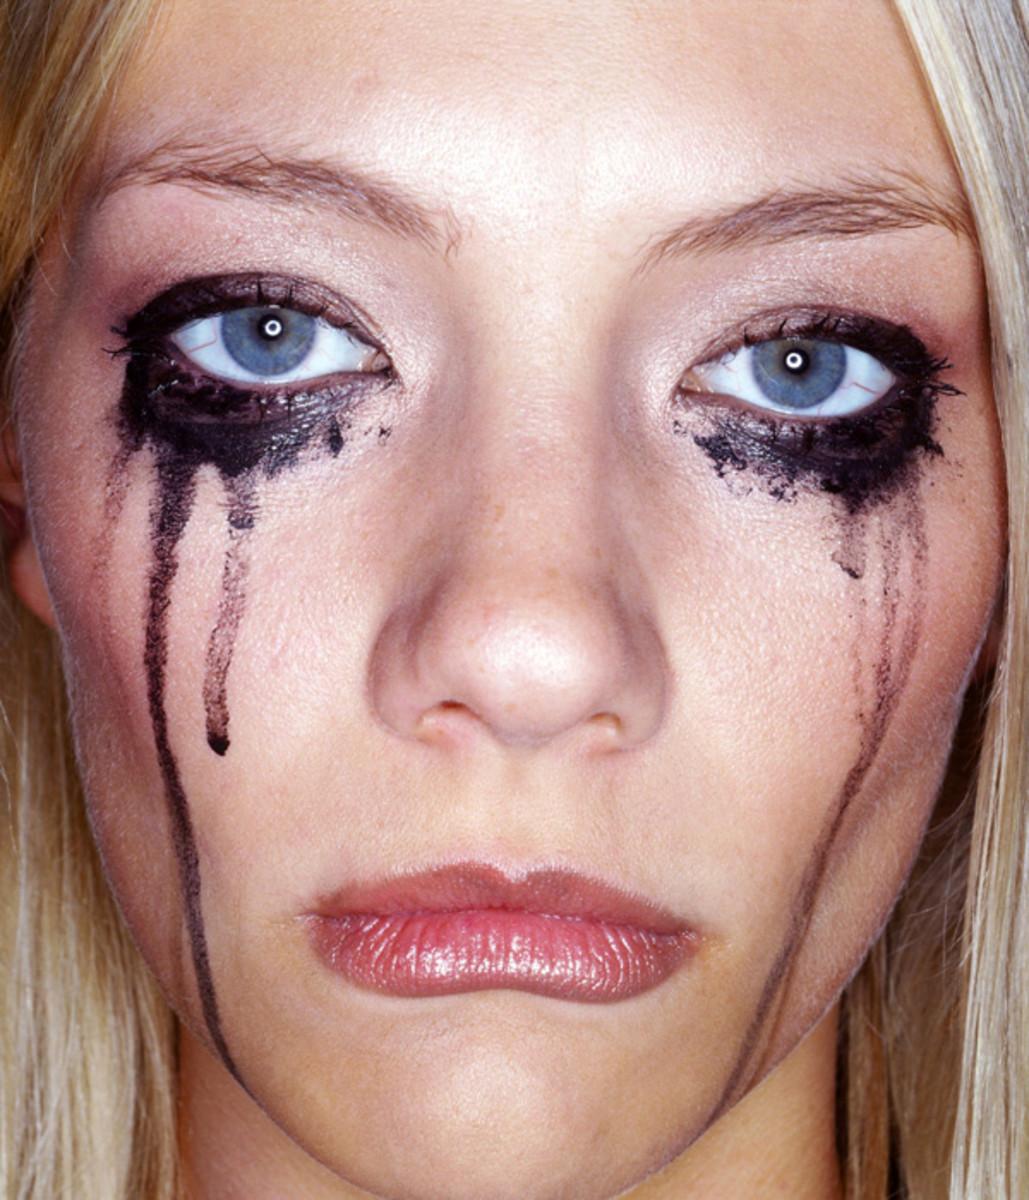 Girl Crying Face Meme